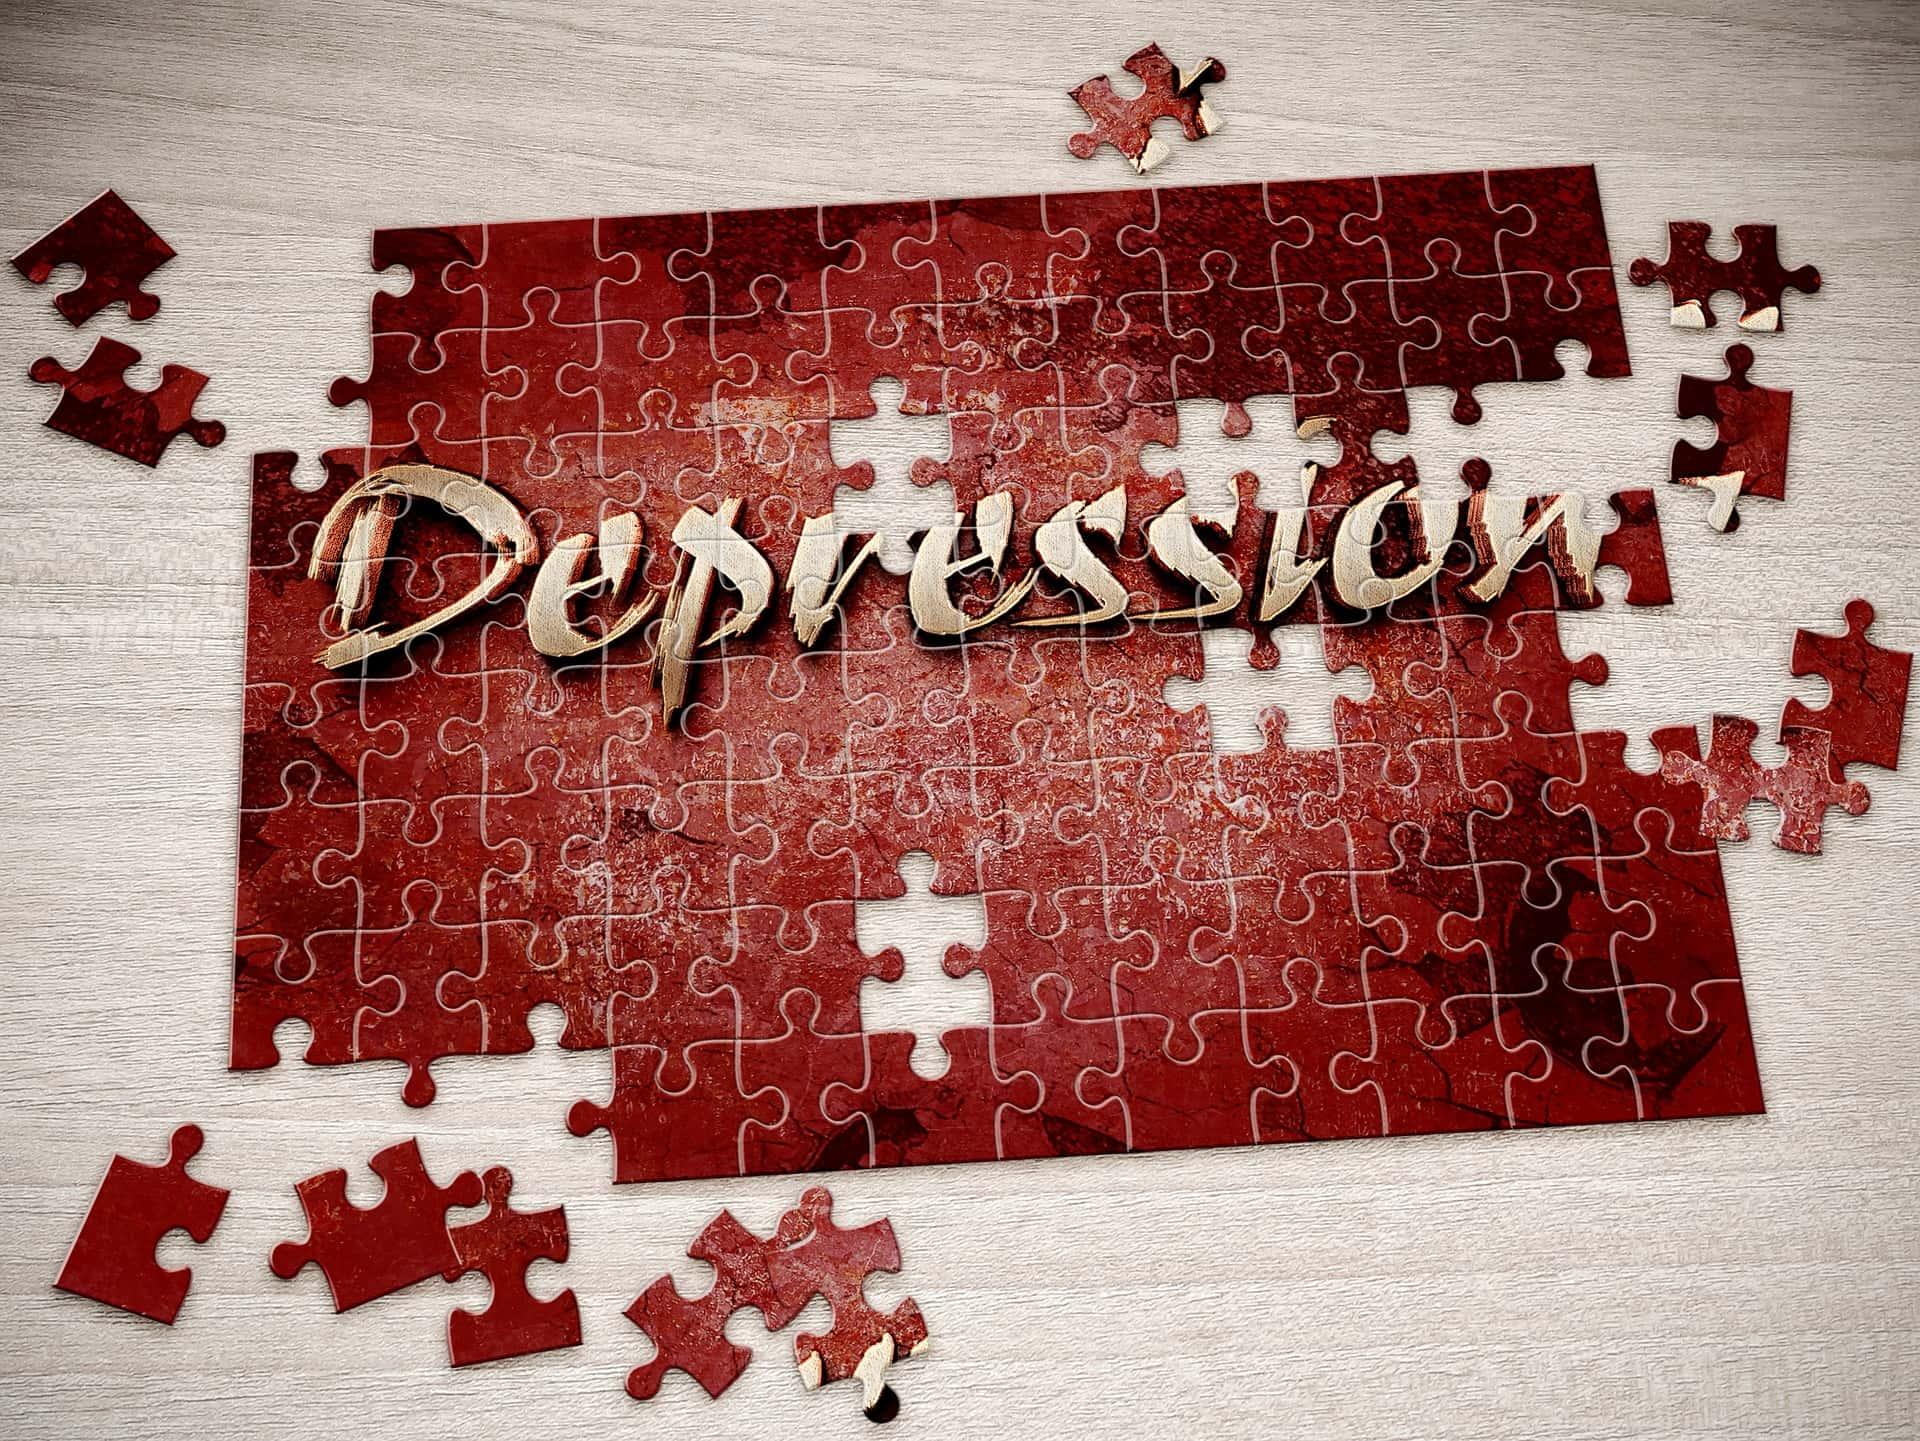 Depression facts